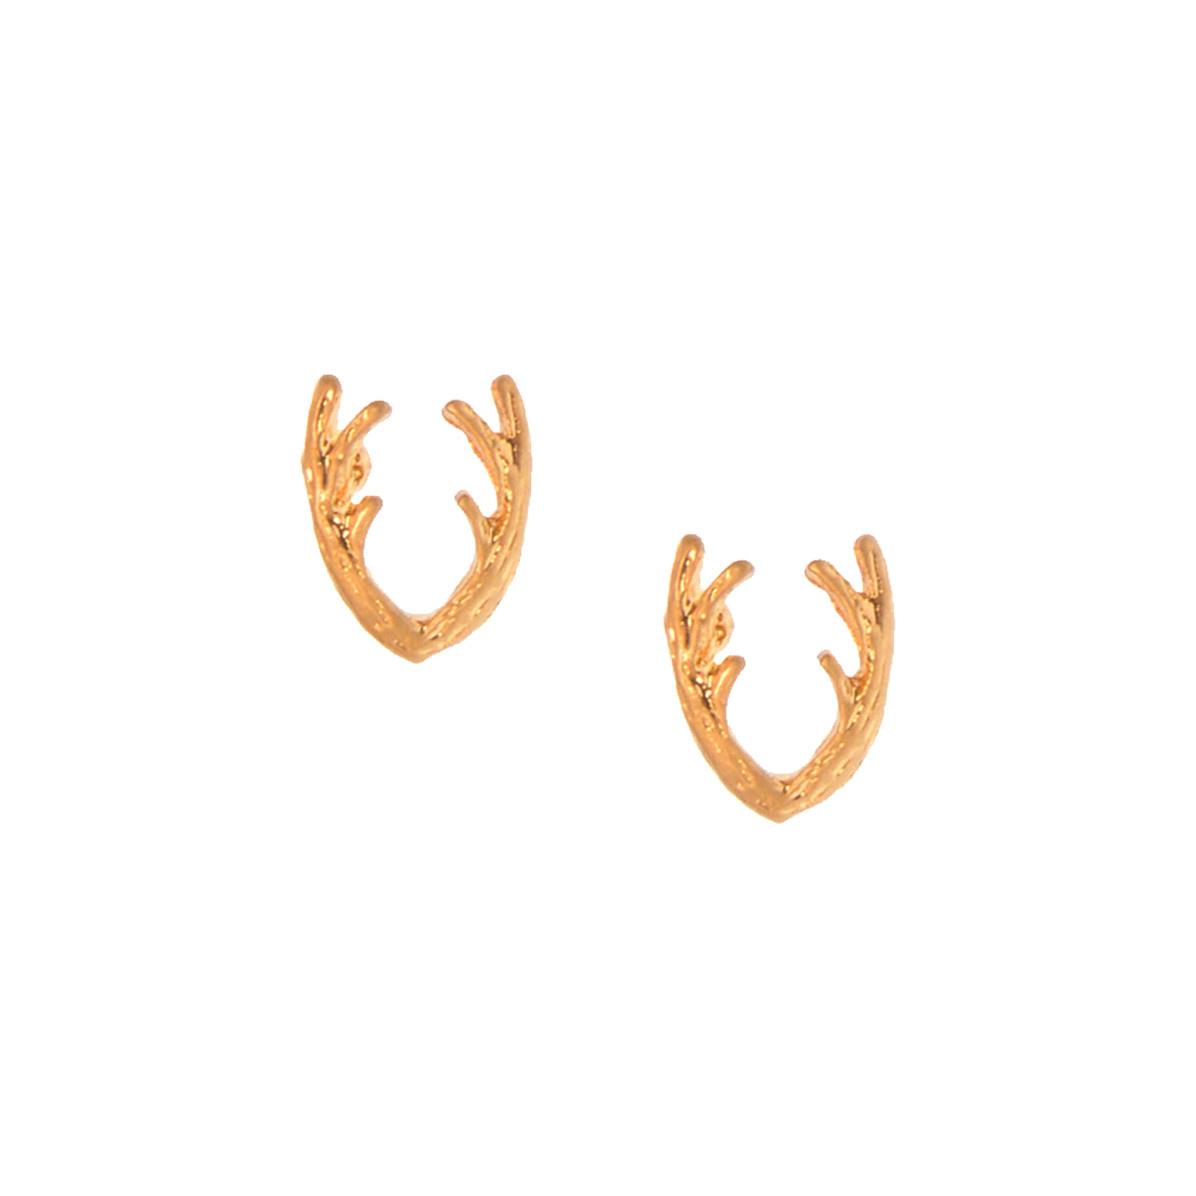 Joy Susan Joy Susan Antler Post Earrings Gold